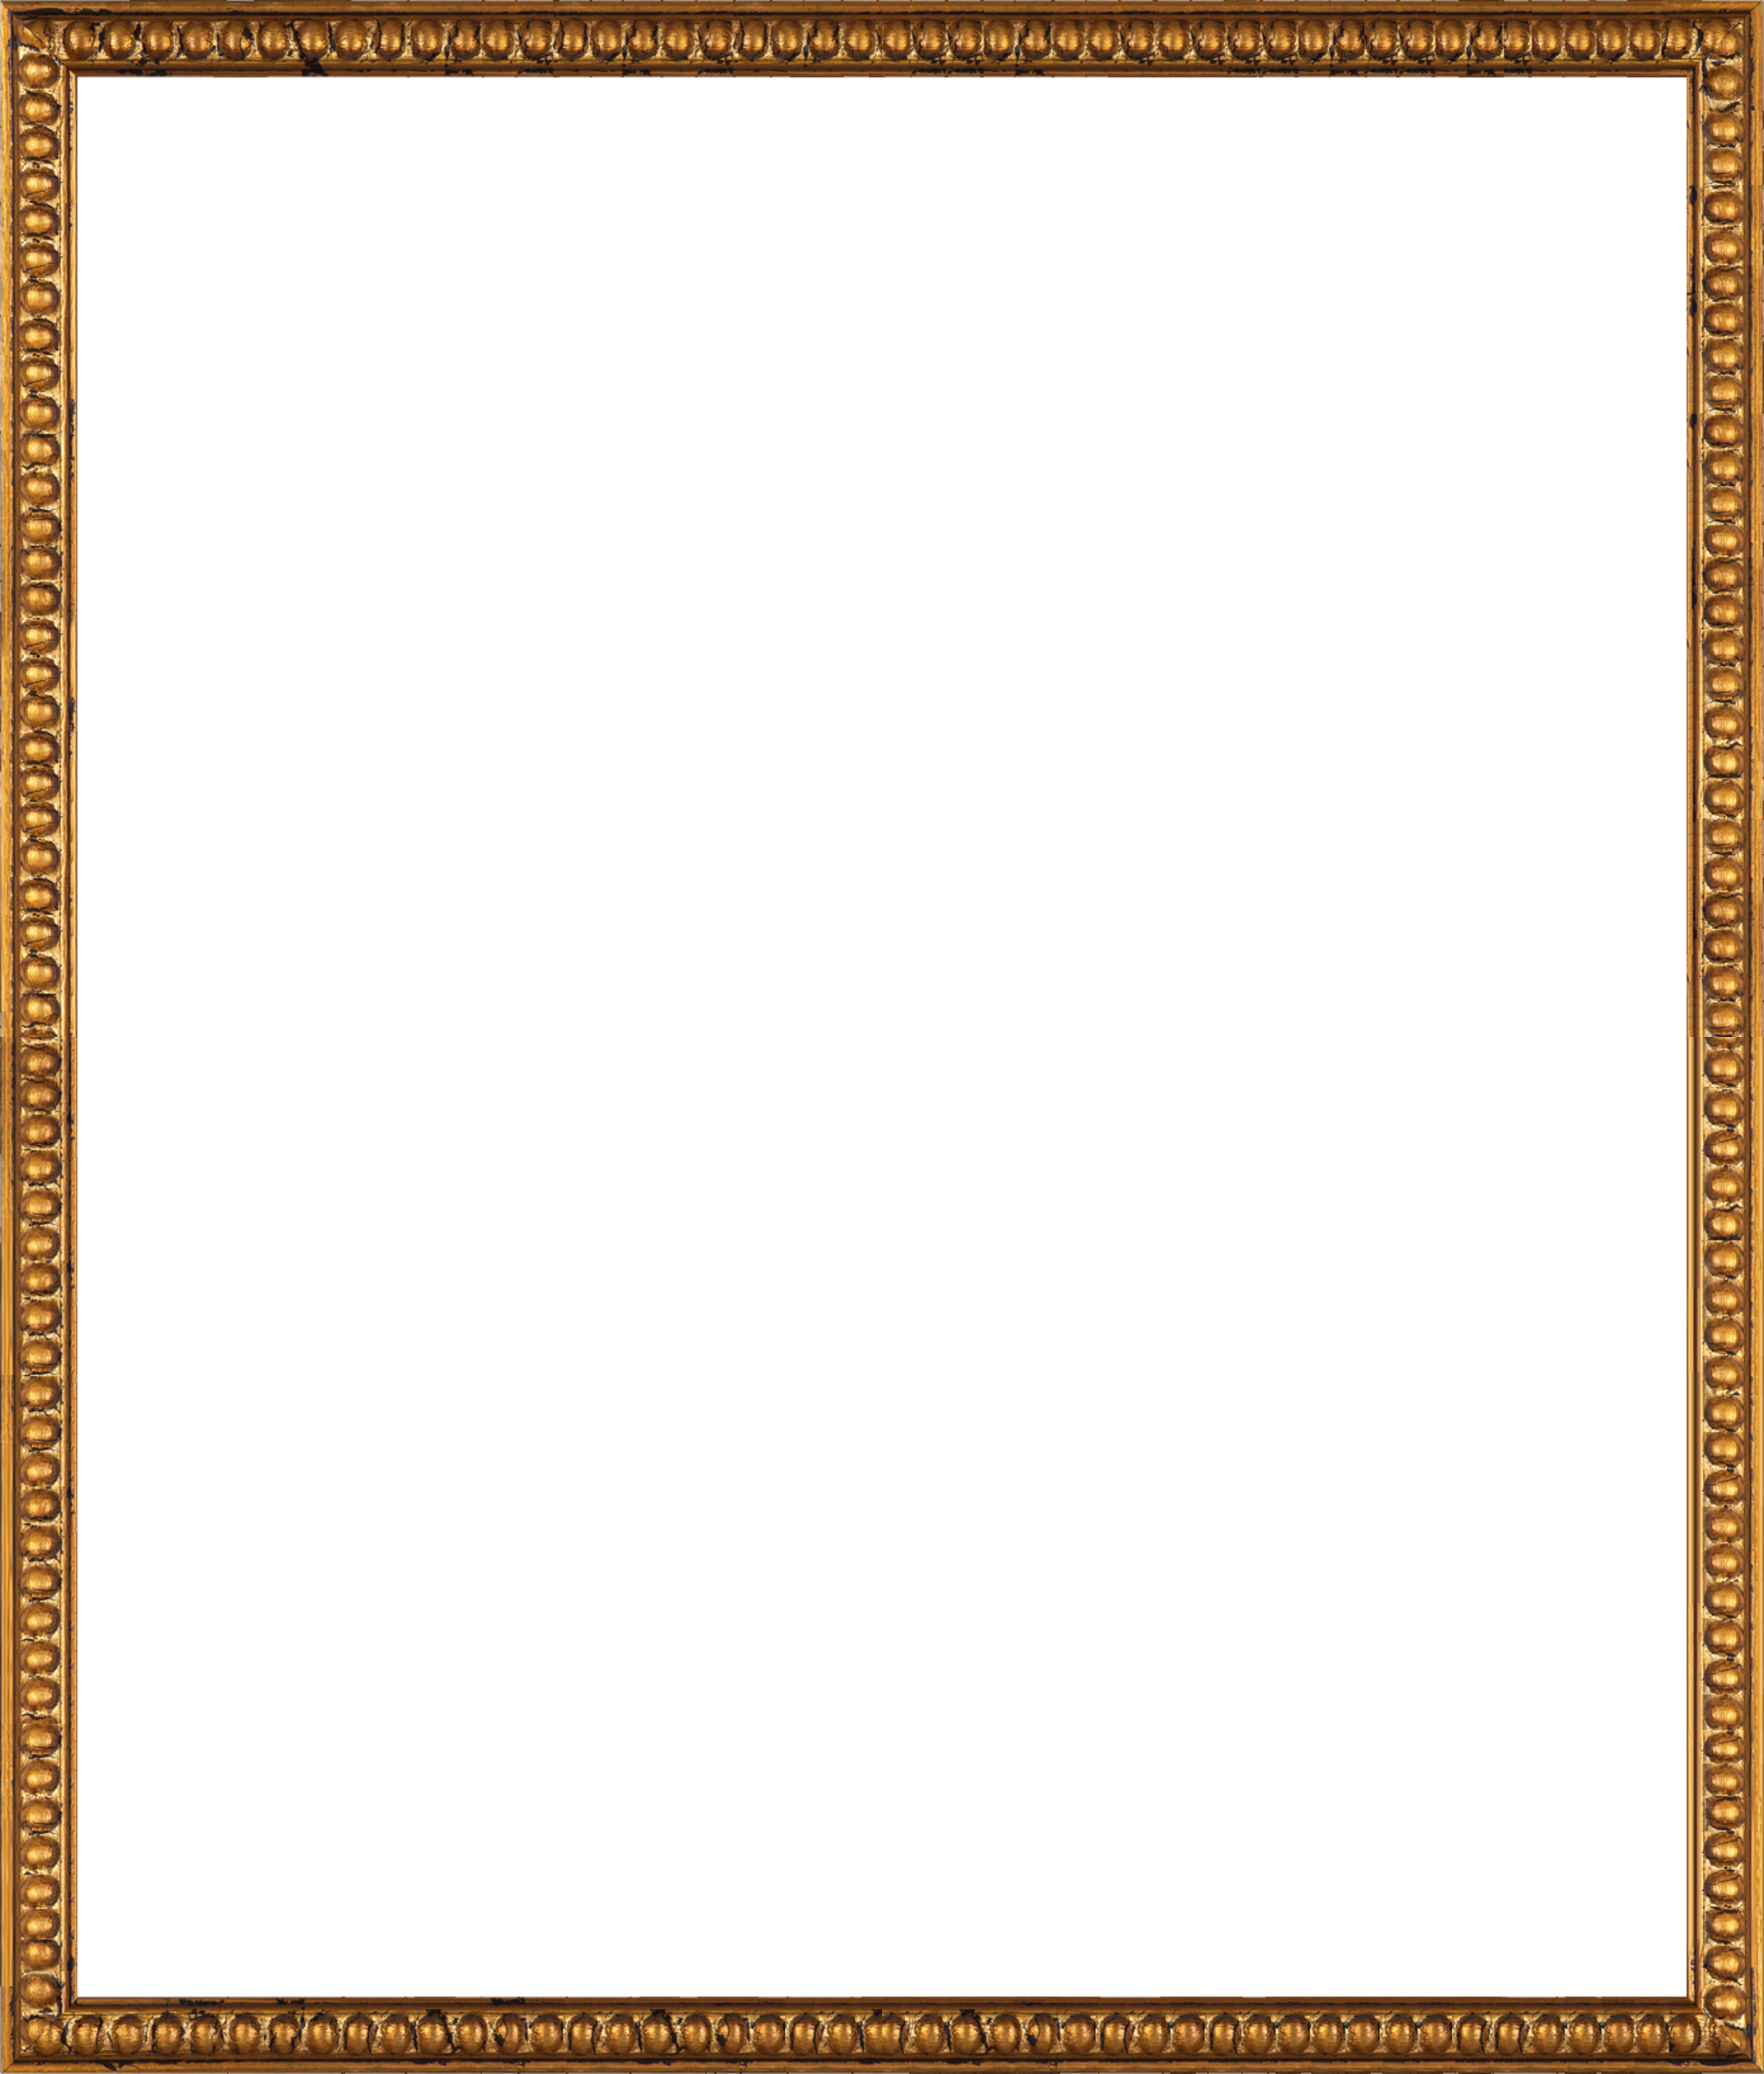 847-1426661744